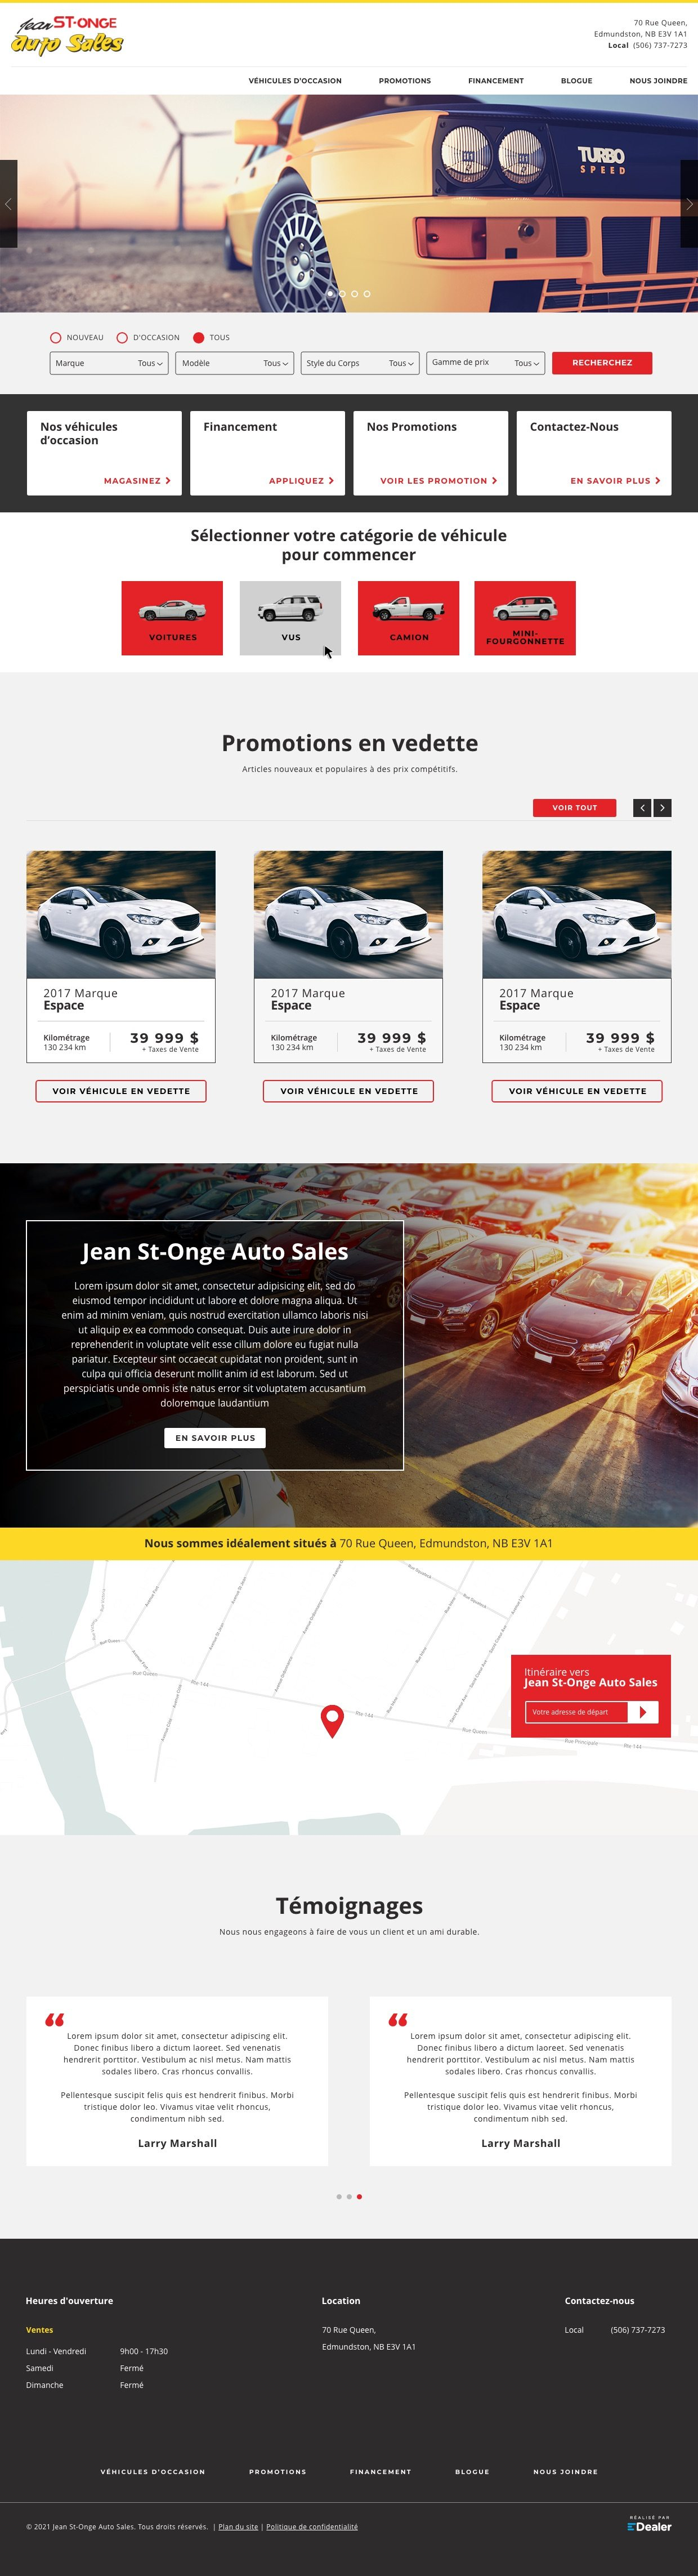 Jean St-Onge Auto Sales